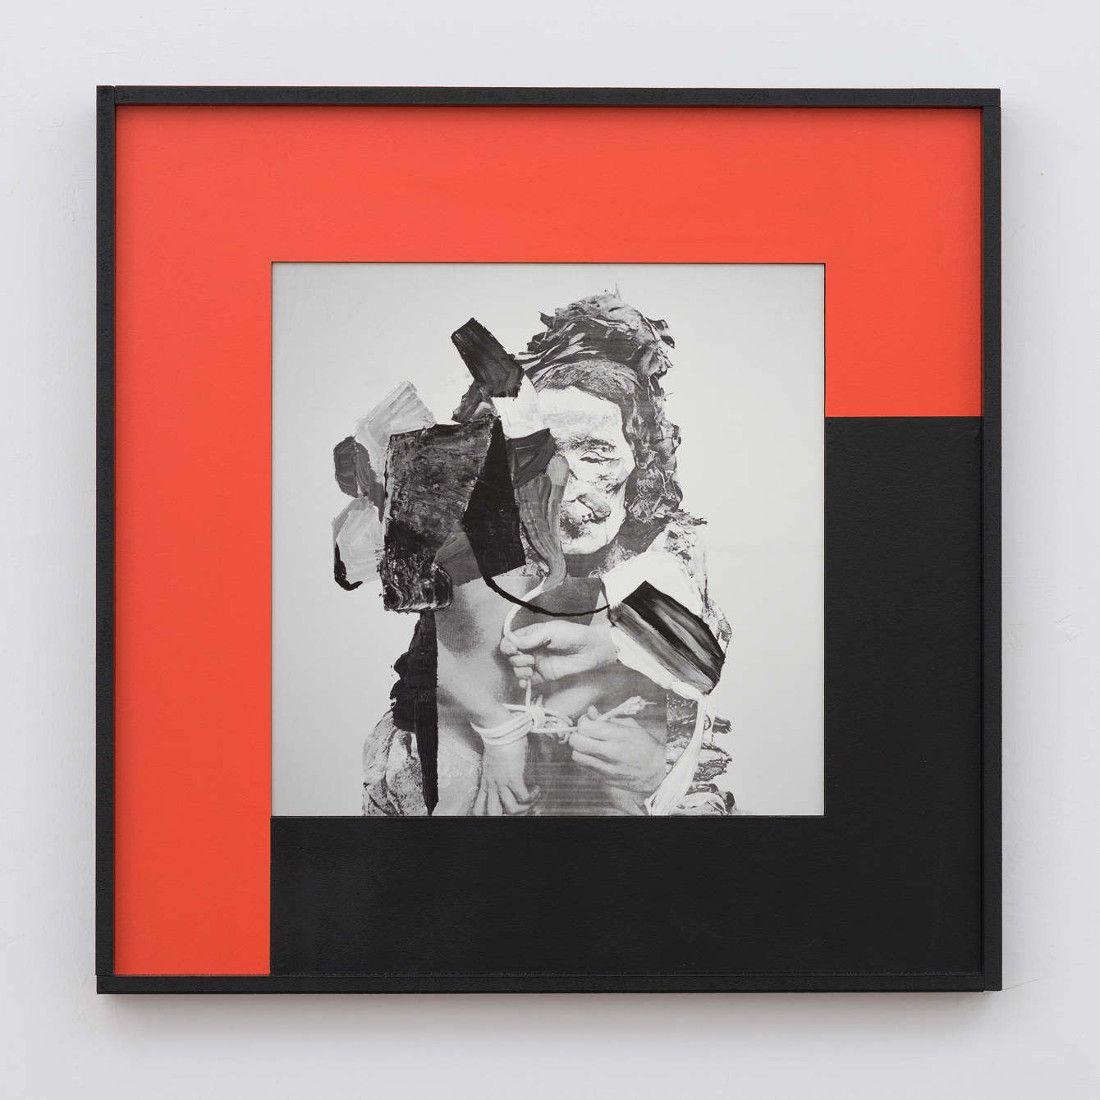 Filip Berendt<br />Monomyth I A<br />2016<br />archival pigment print on dibond acrylic  paint, MDF<br />50x50 cm